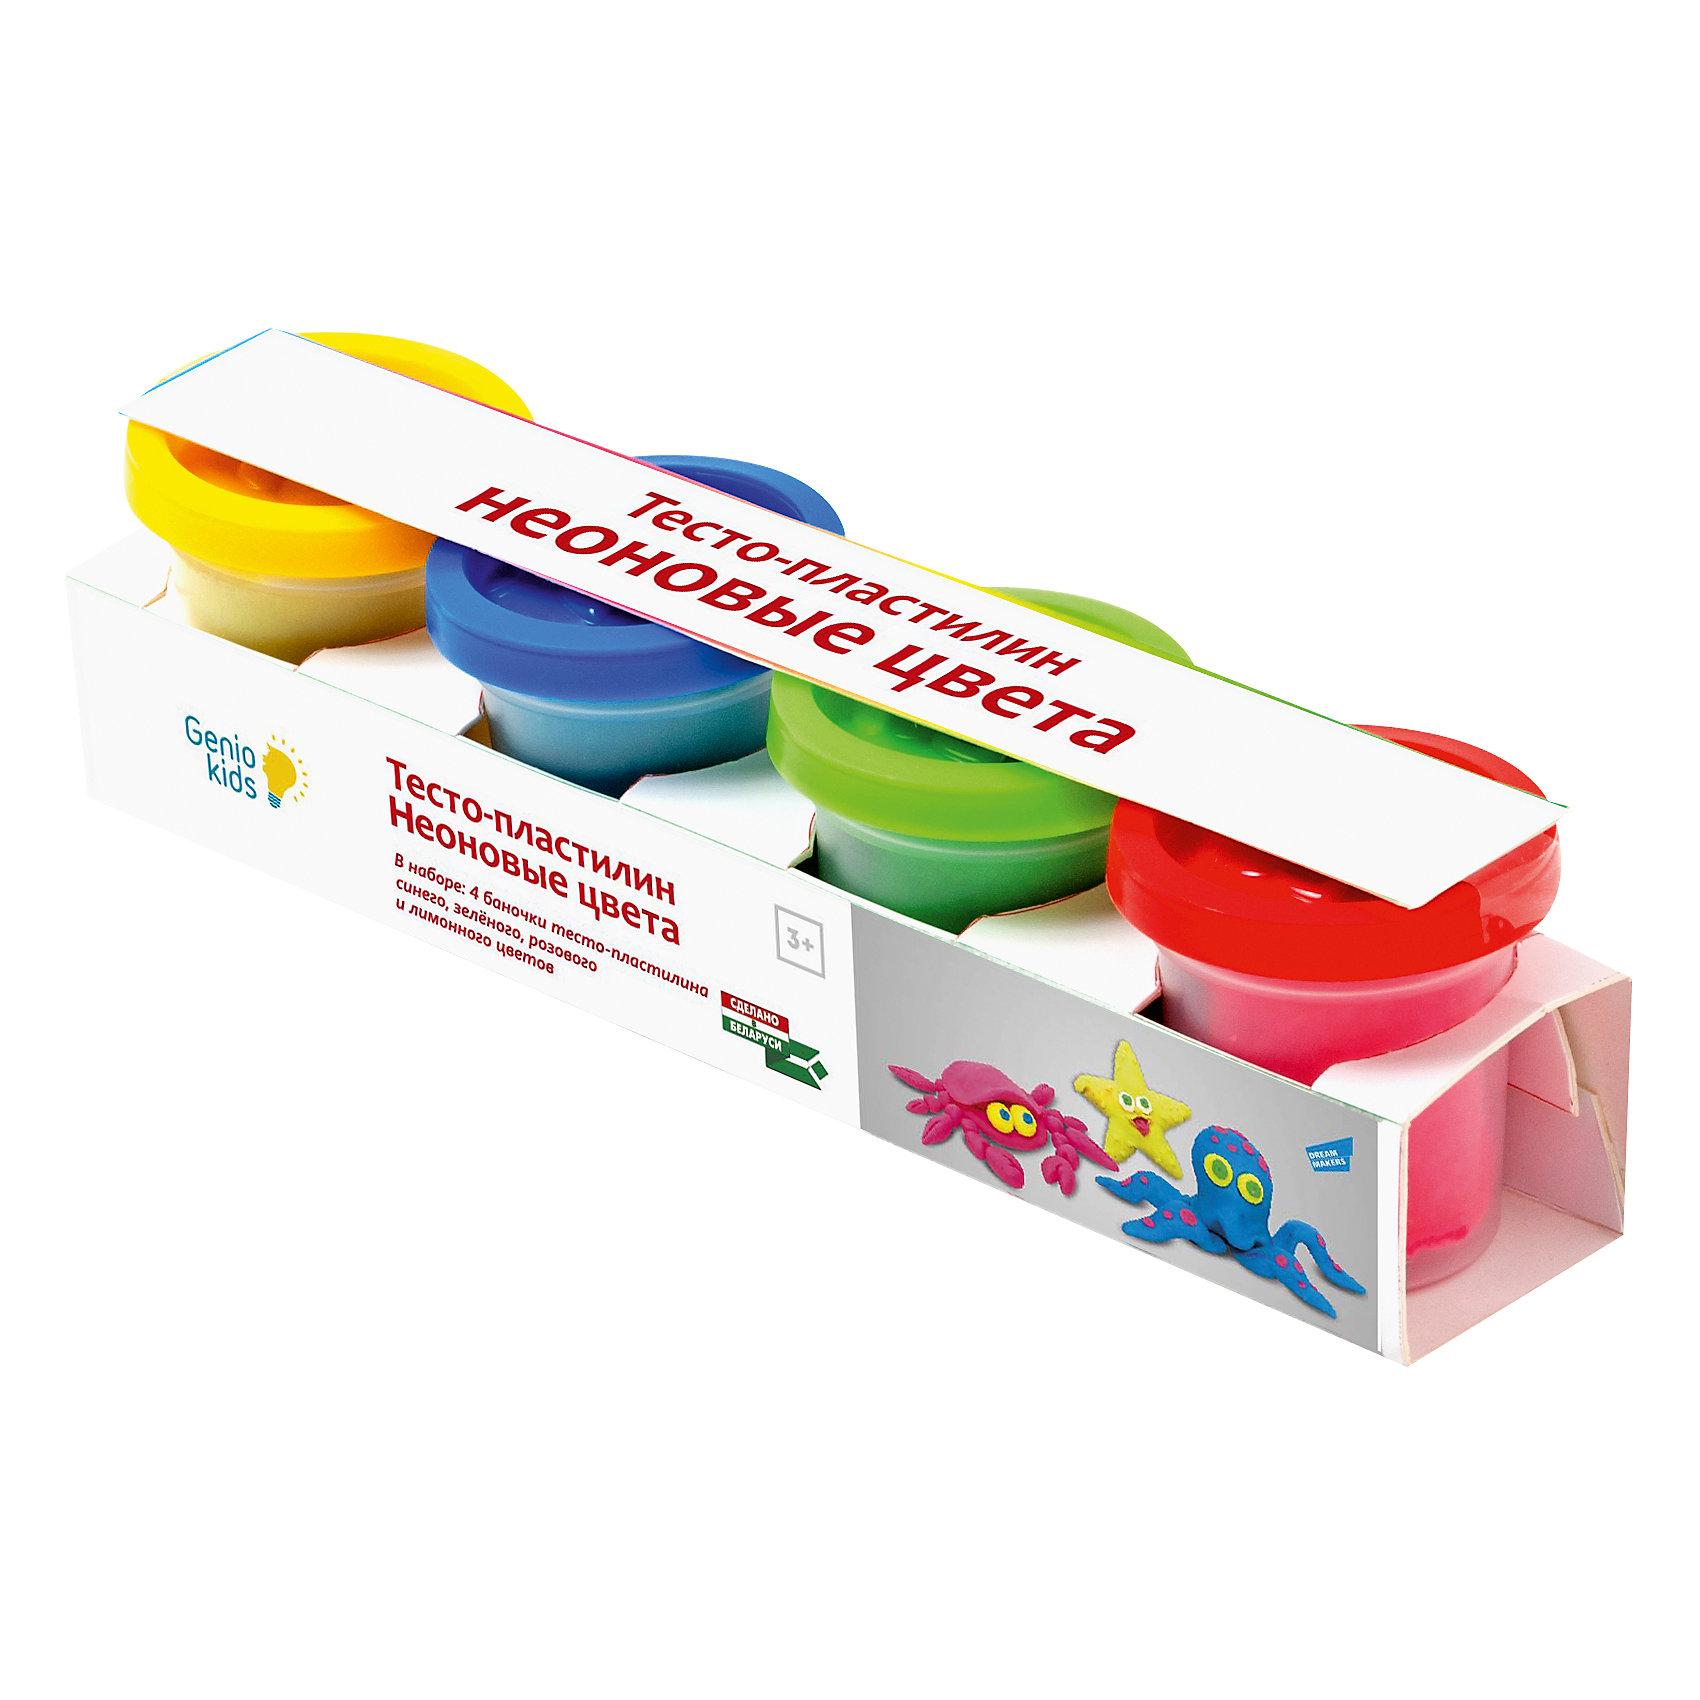 "Genio Kids Тесто-пластилин Неоновые цвета genio kids набор для детского творчества ""шкатулка"""